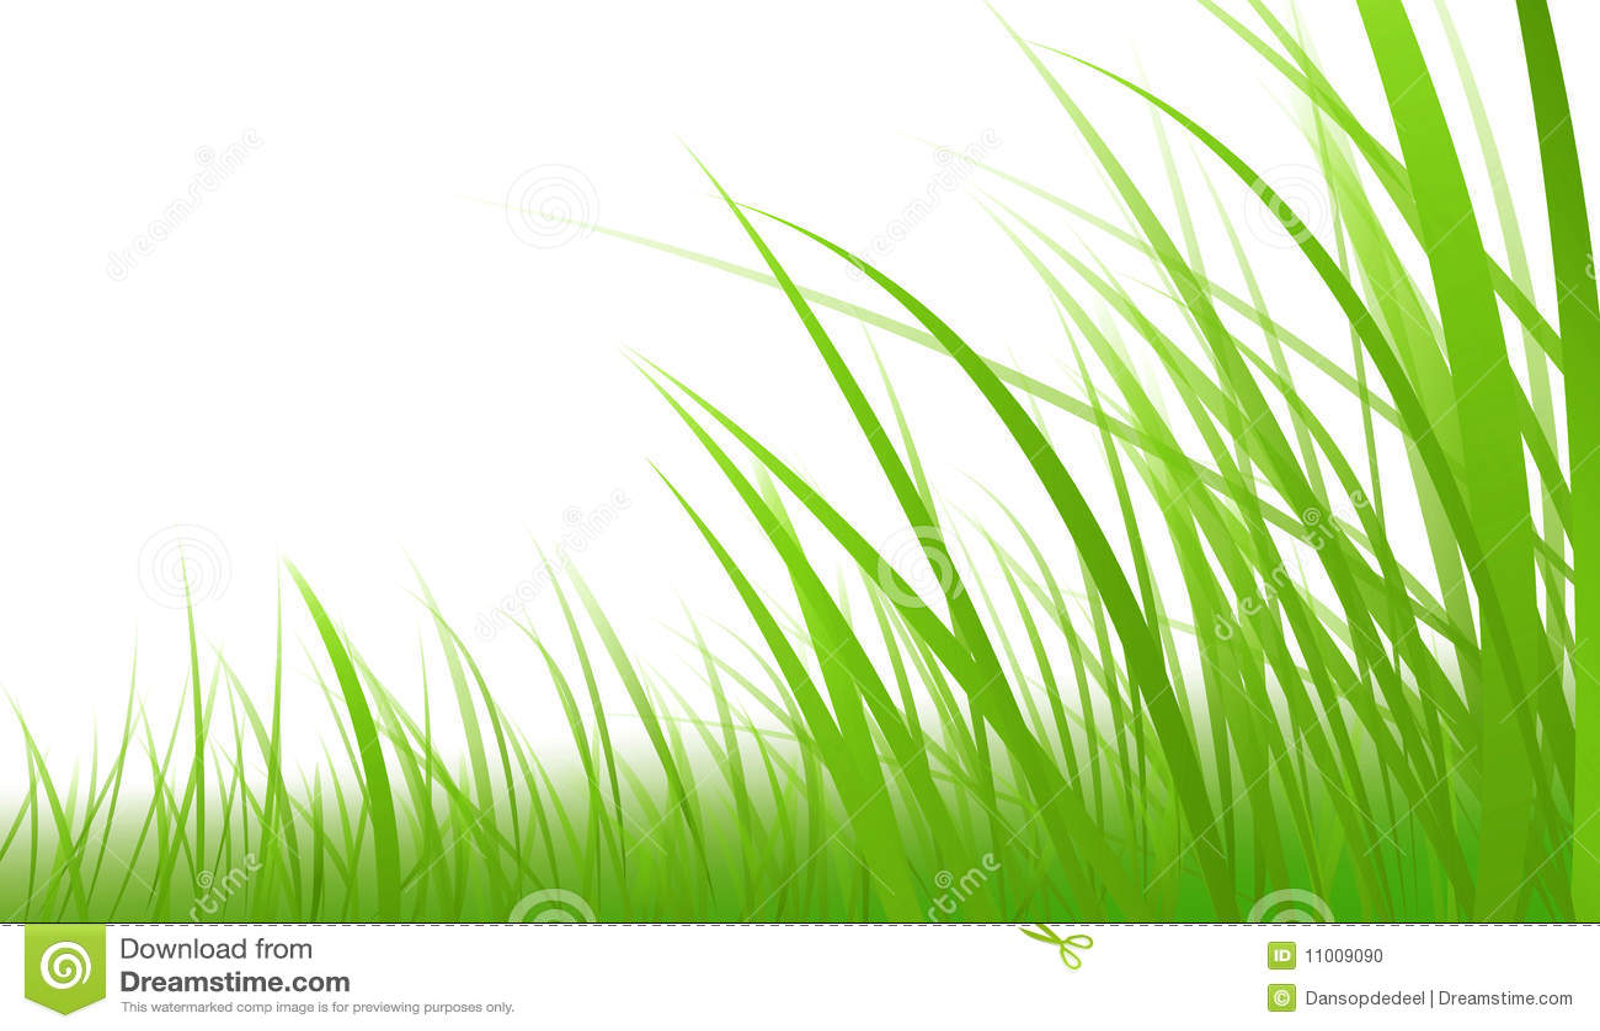 Similar Galleries: Grass Clip Art , Grass Drawing Pencil ,